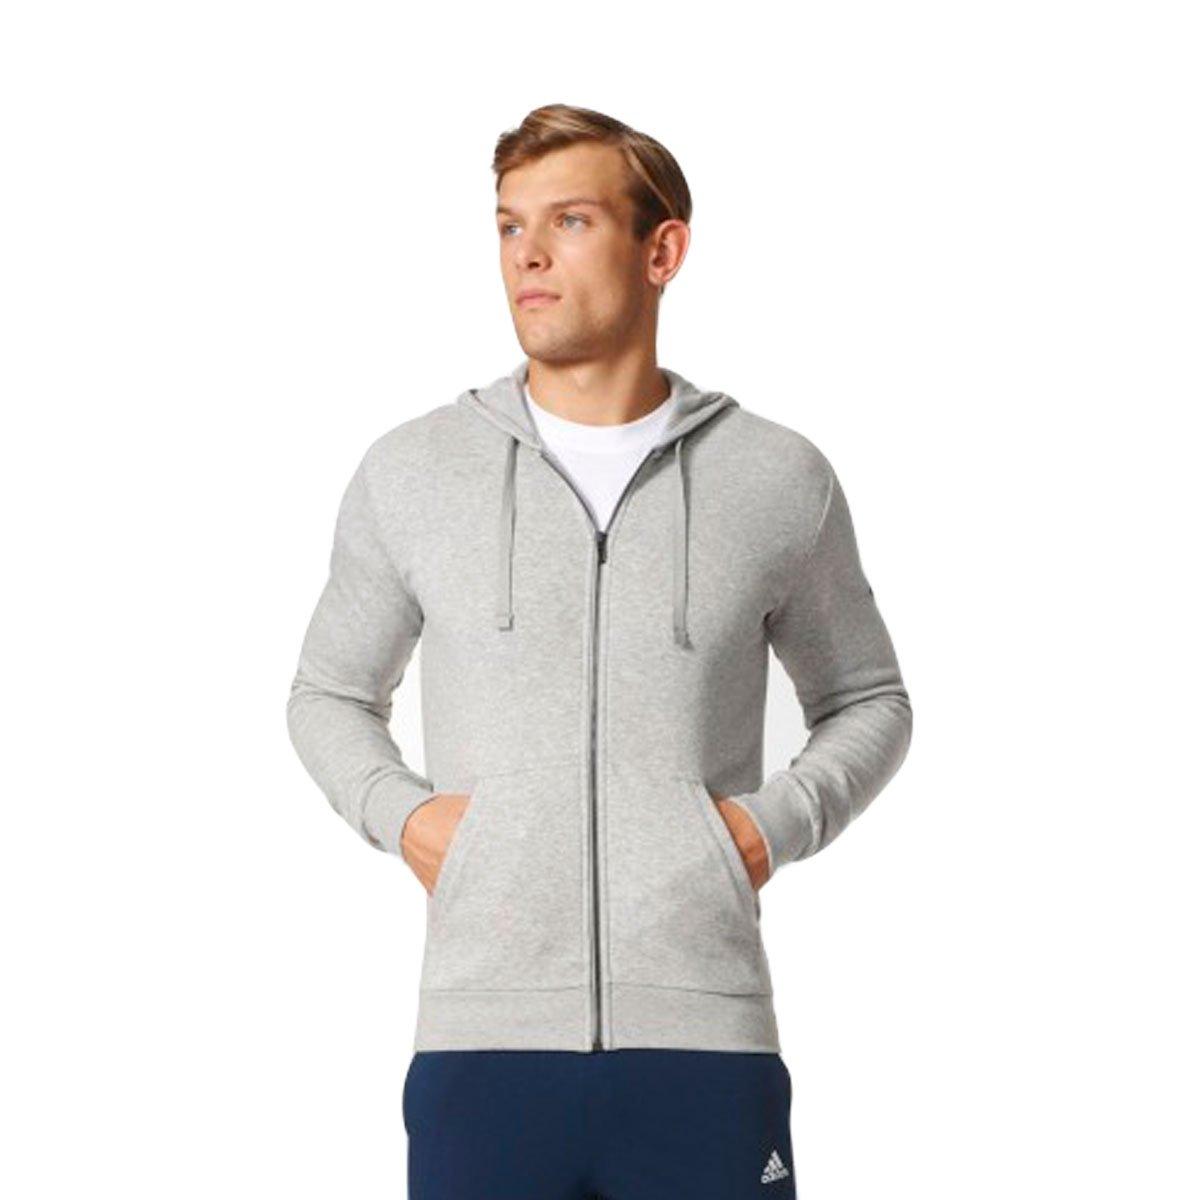 d9aea28e30e Bizz Store - Jaqueta Masculina Adidas Essentials Base Fleece